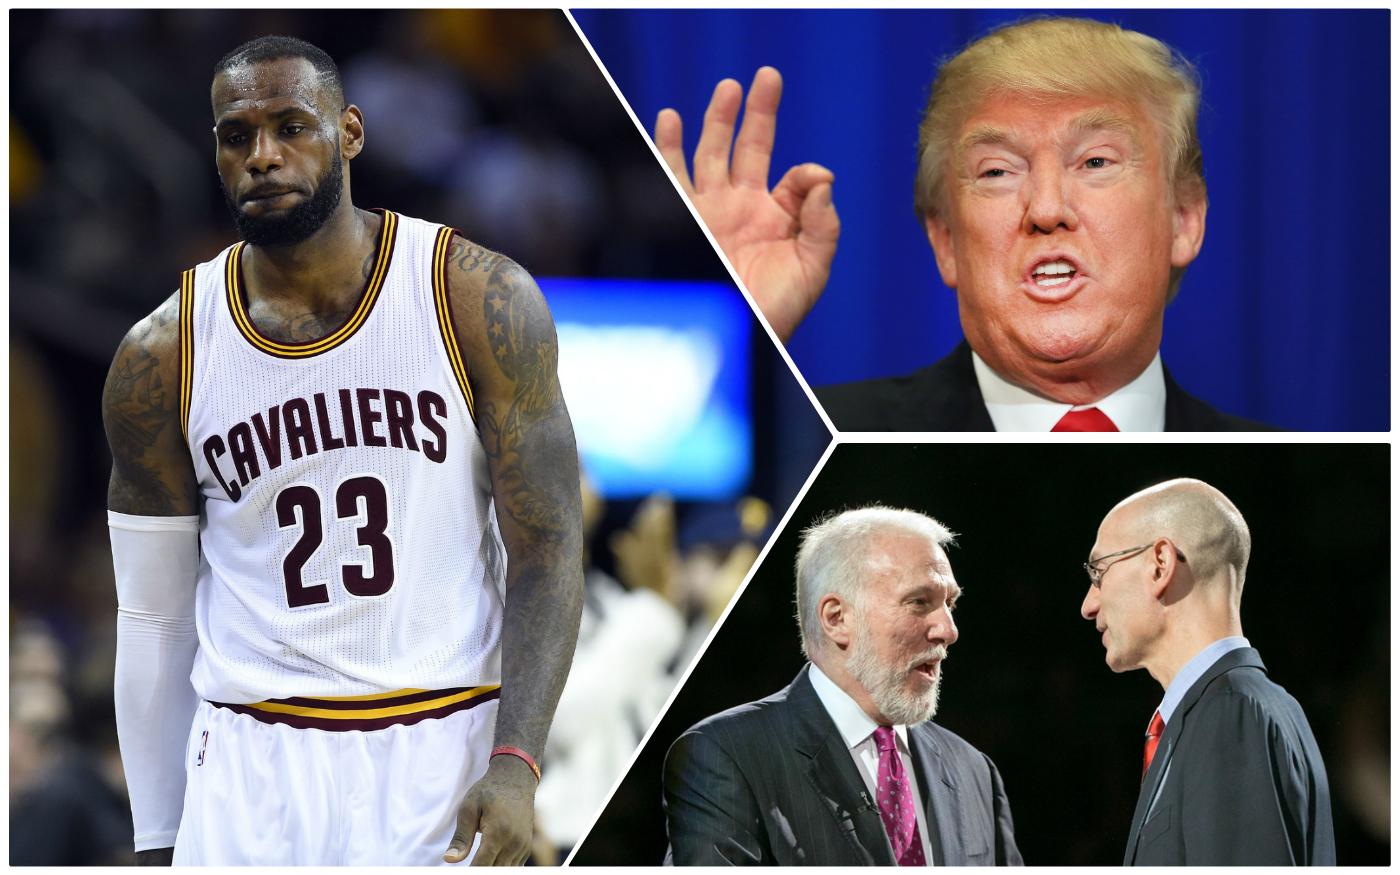 Trump vainqueur, LeBron battu : ce qu'on a retenu de la nuit